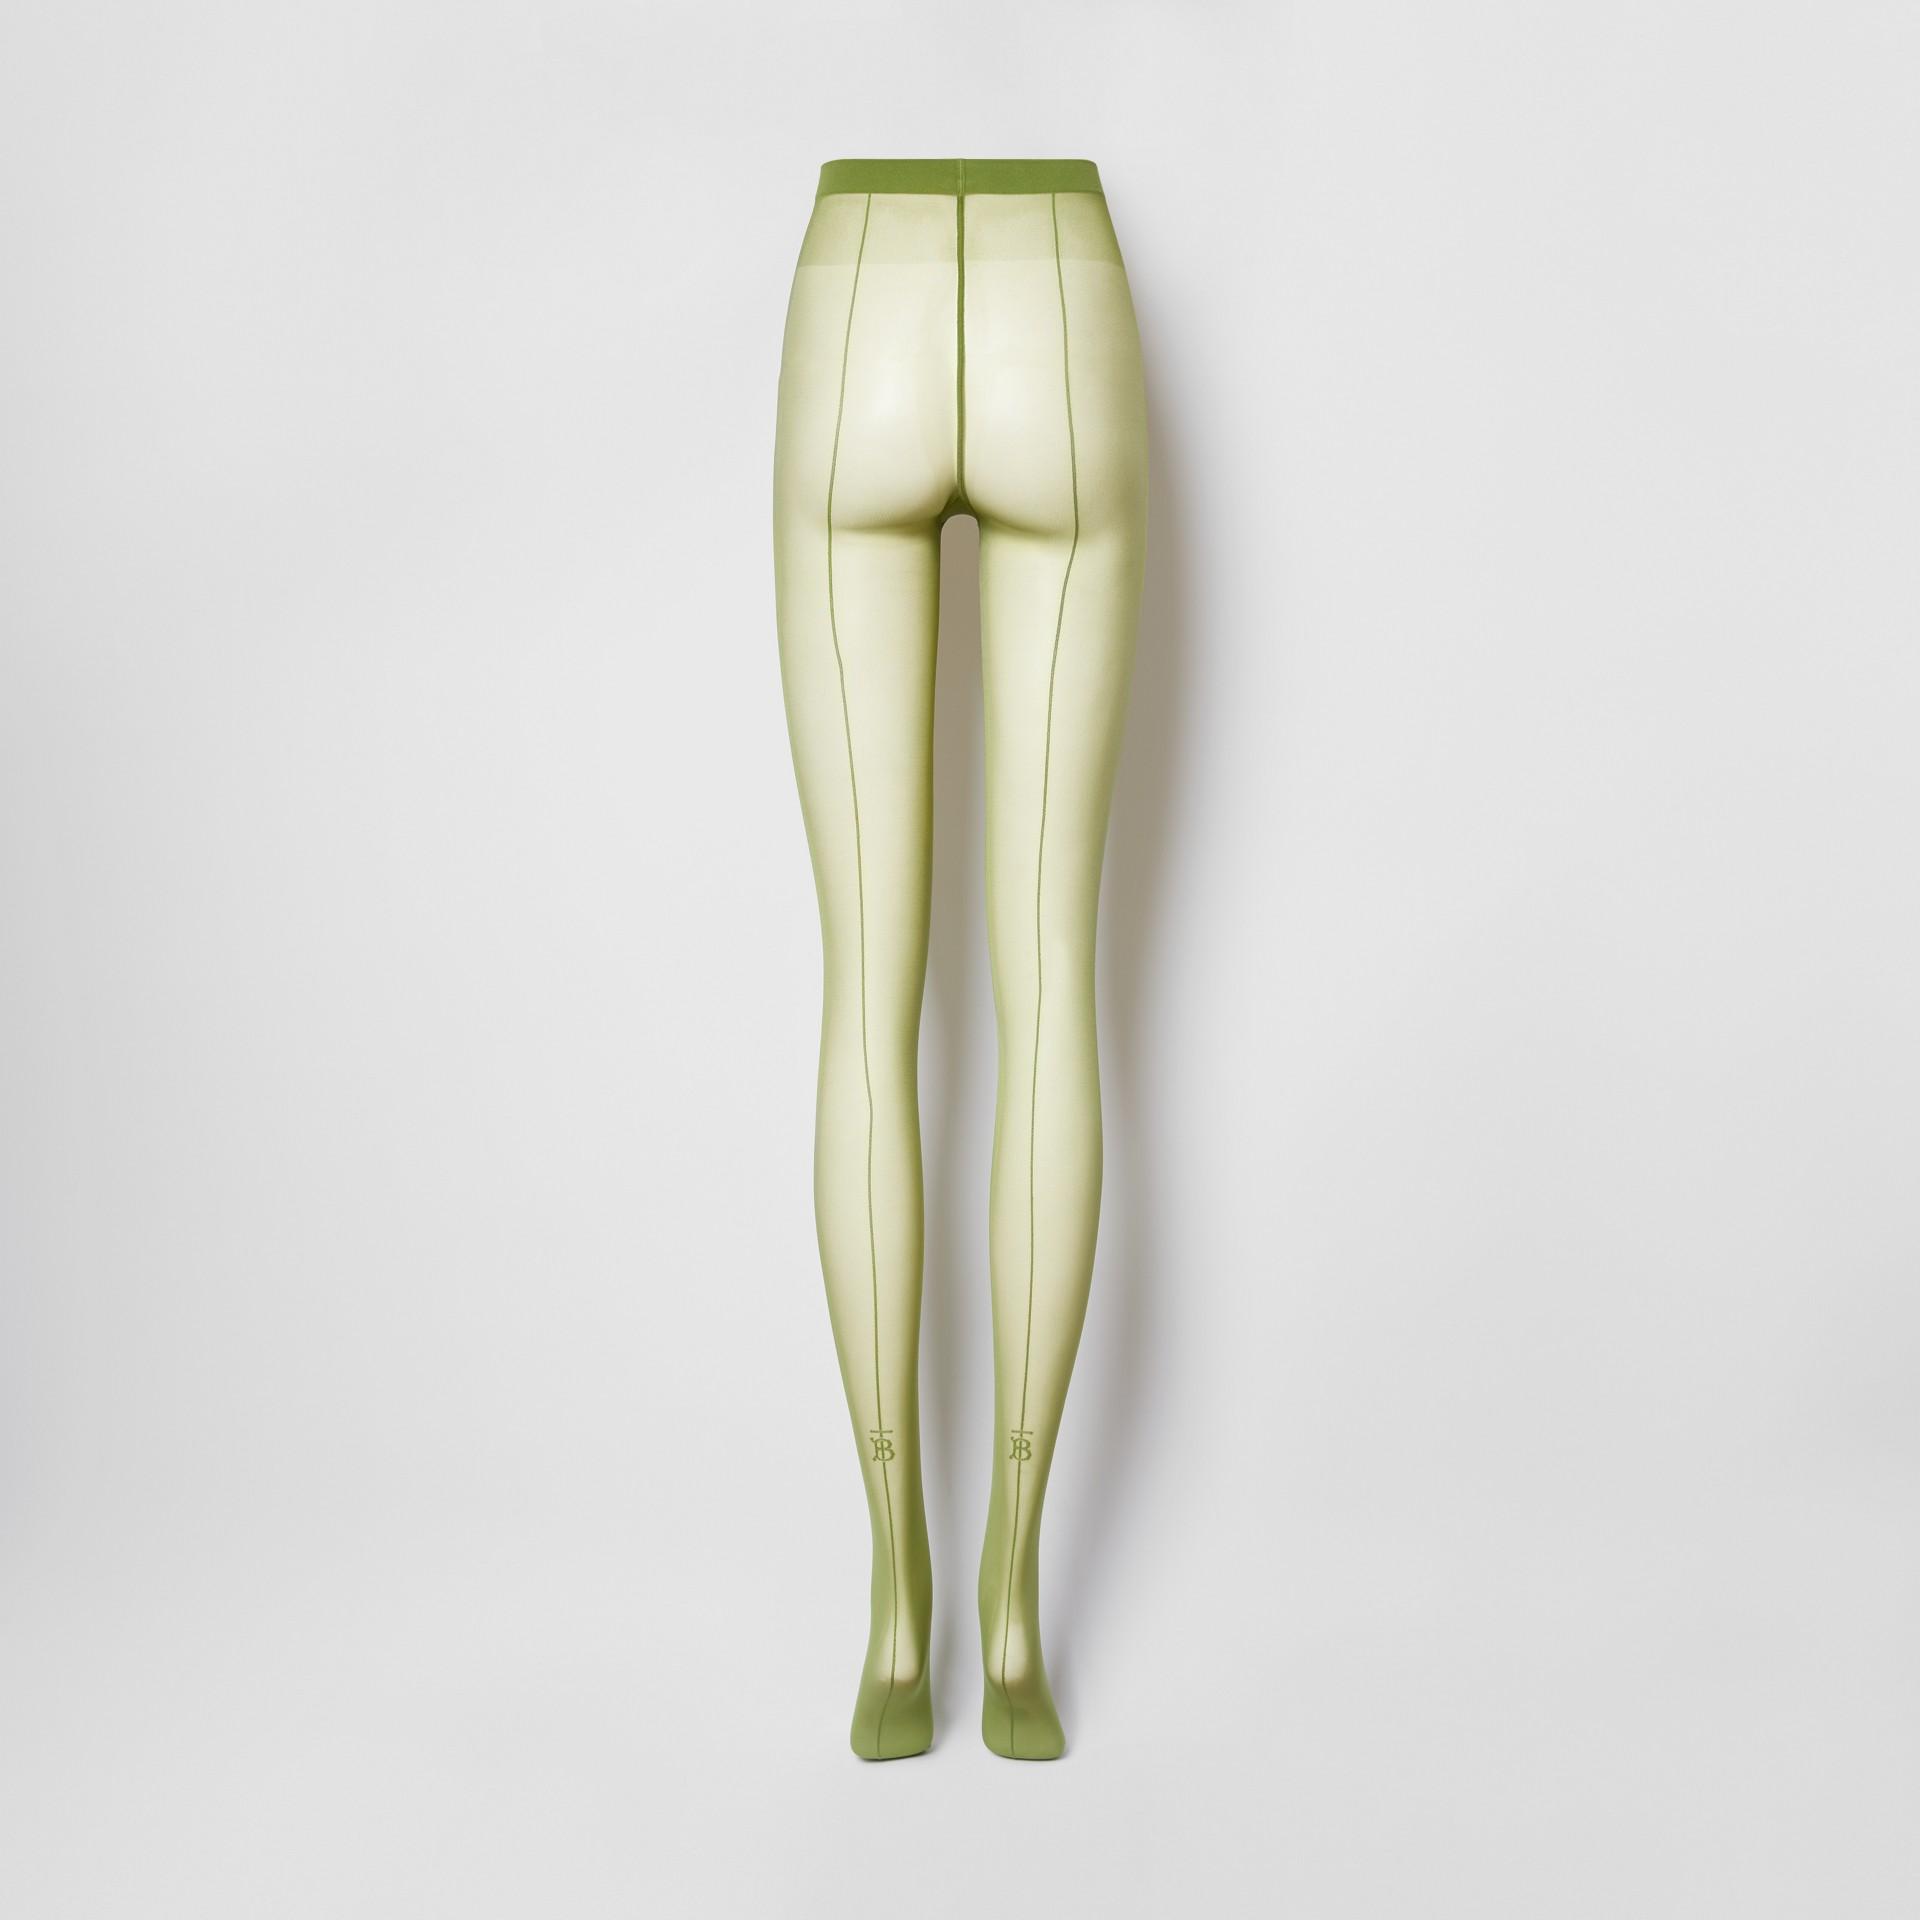 Monogram Motif Seamed Tights in Cedar Green - Women | Burberry Singapore - gallery image 4